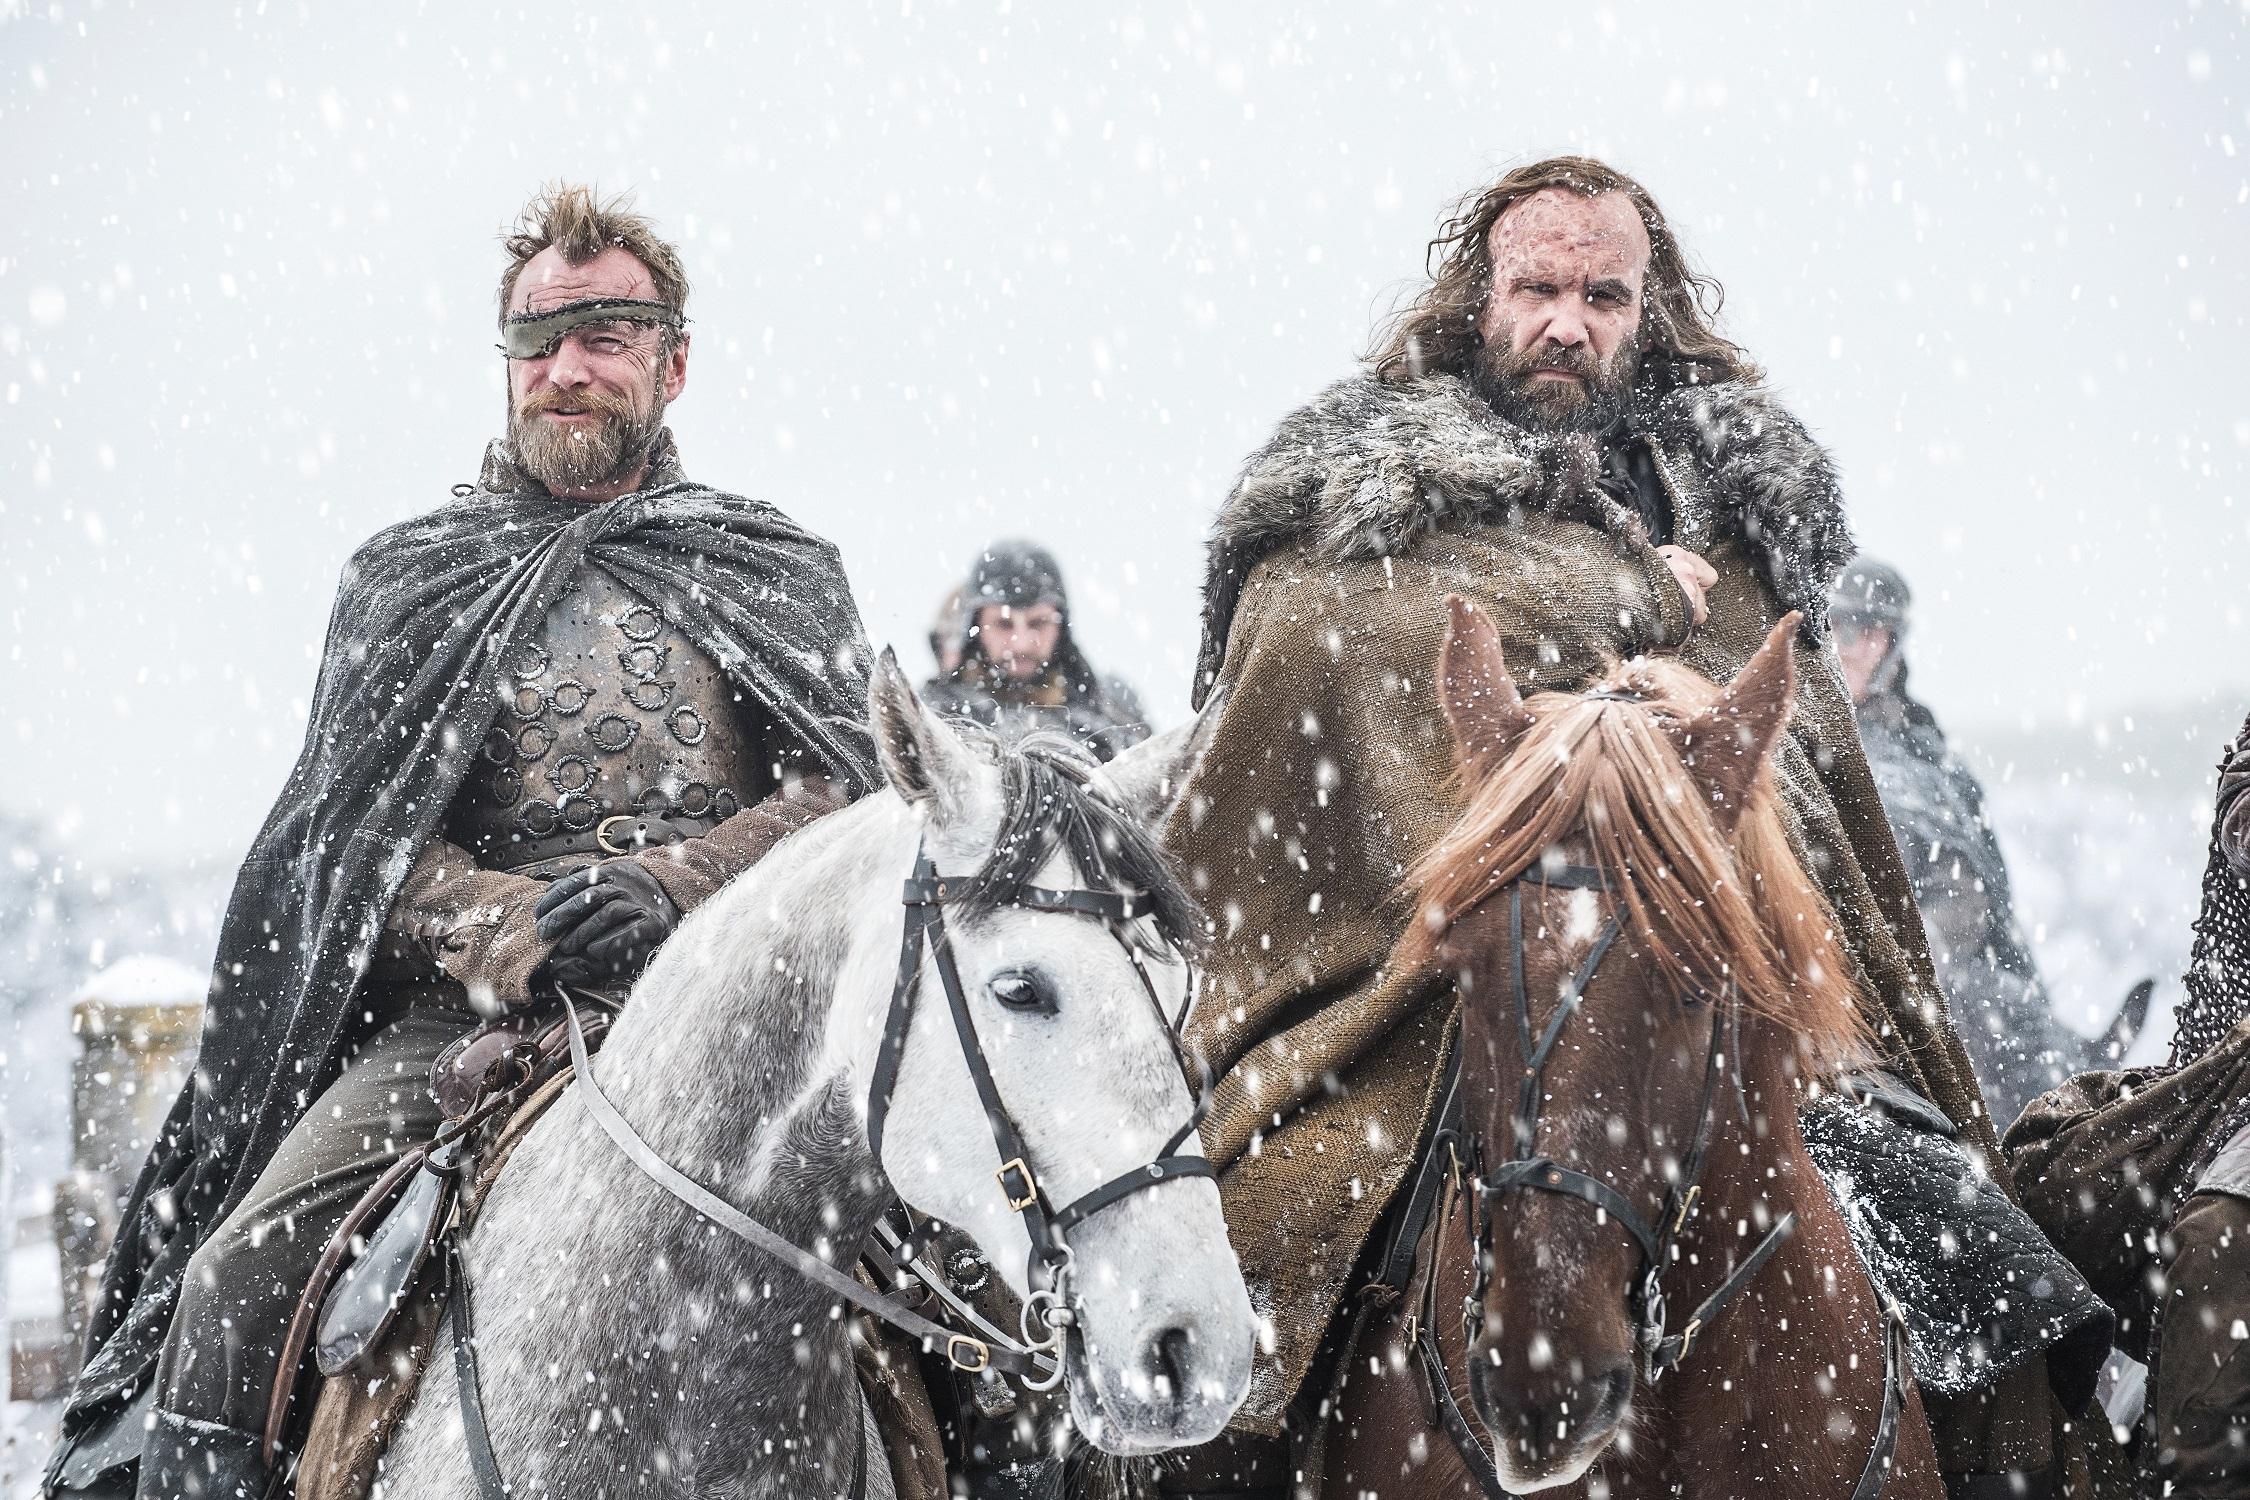 Richard Dormer as Lord Beric, Rory McCann as Sandor. Photo: HBO